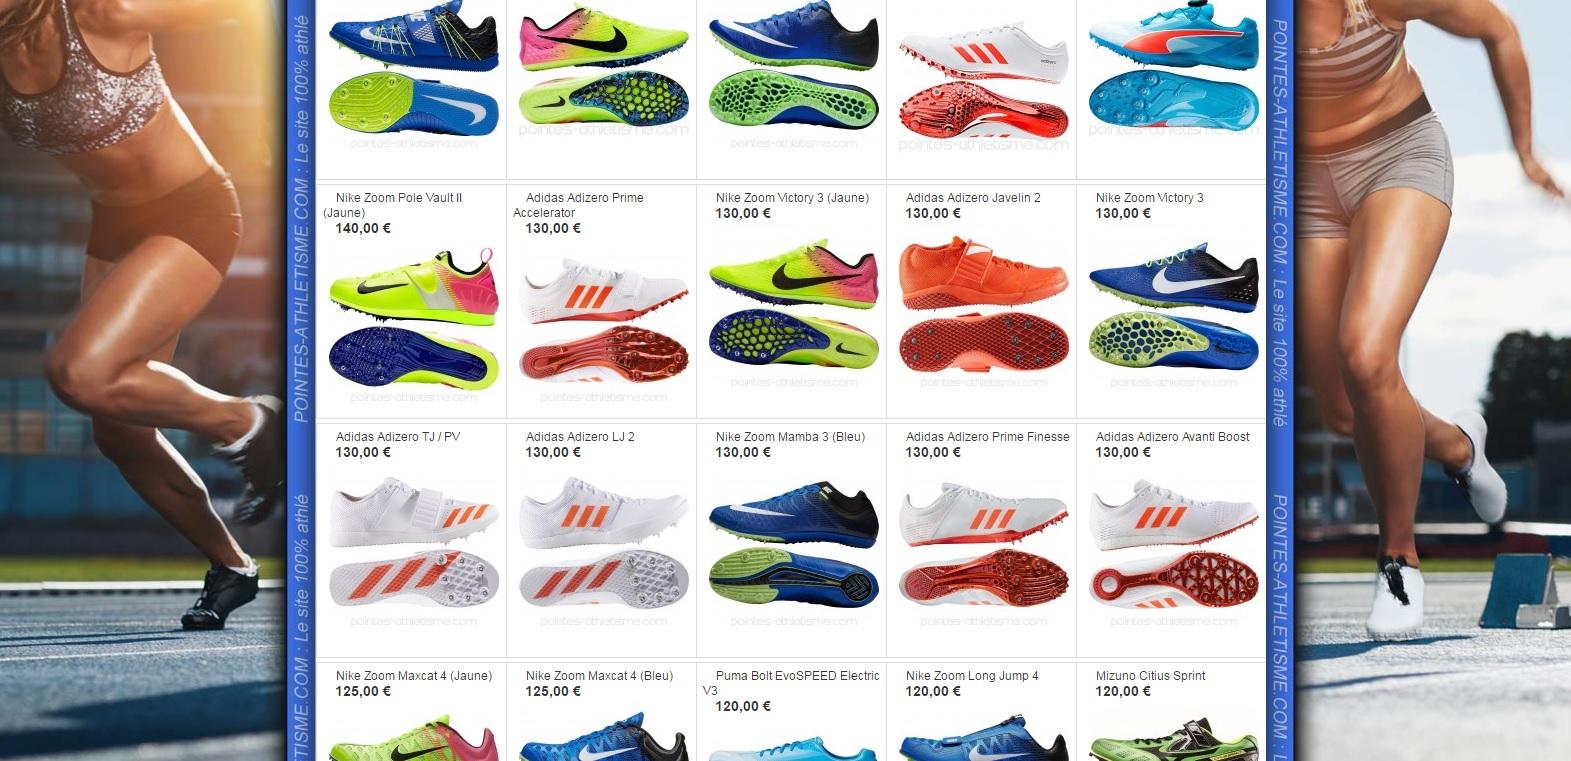 Chiodate Nike Nike Zalando Nike Zalando Chiodate Zalando Chiodate Scarpe Scarpe Scarpe kXuwOTPZi